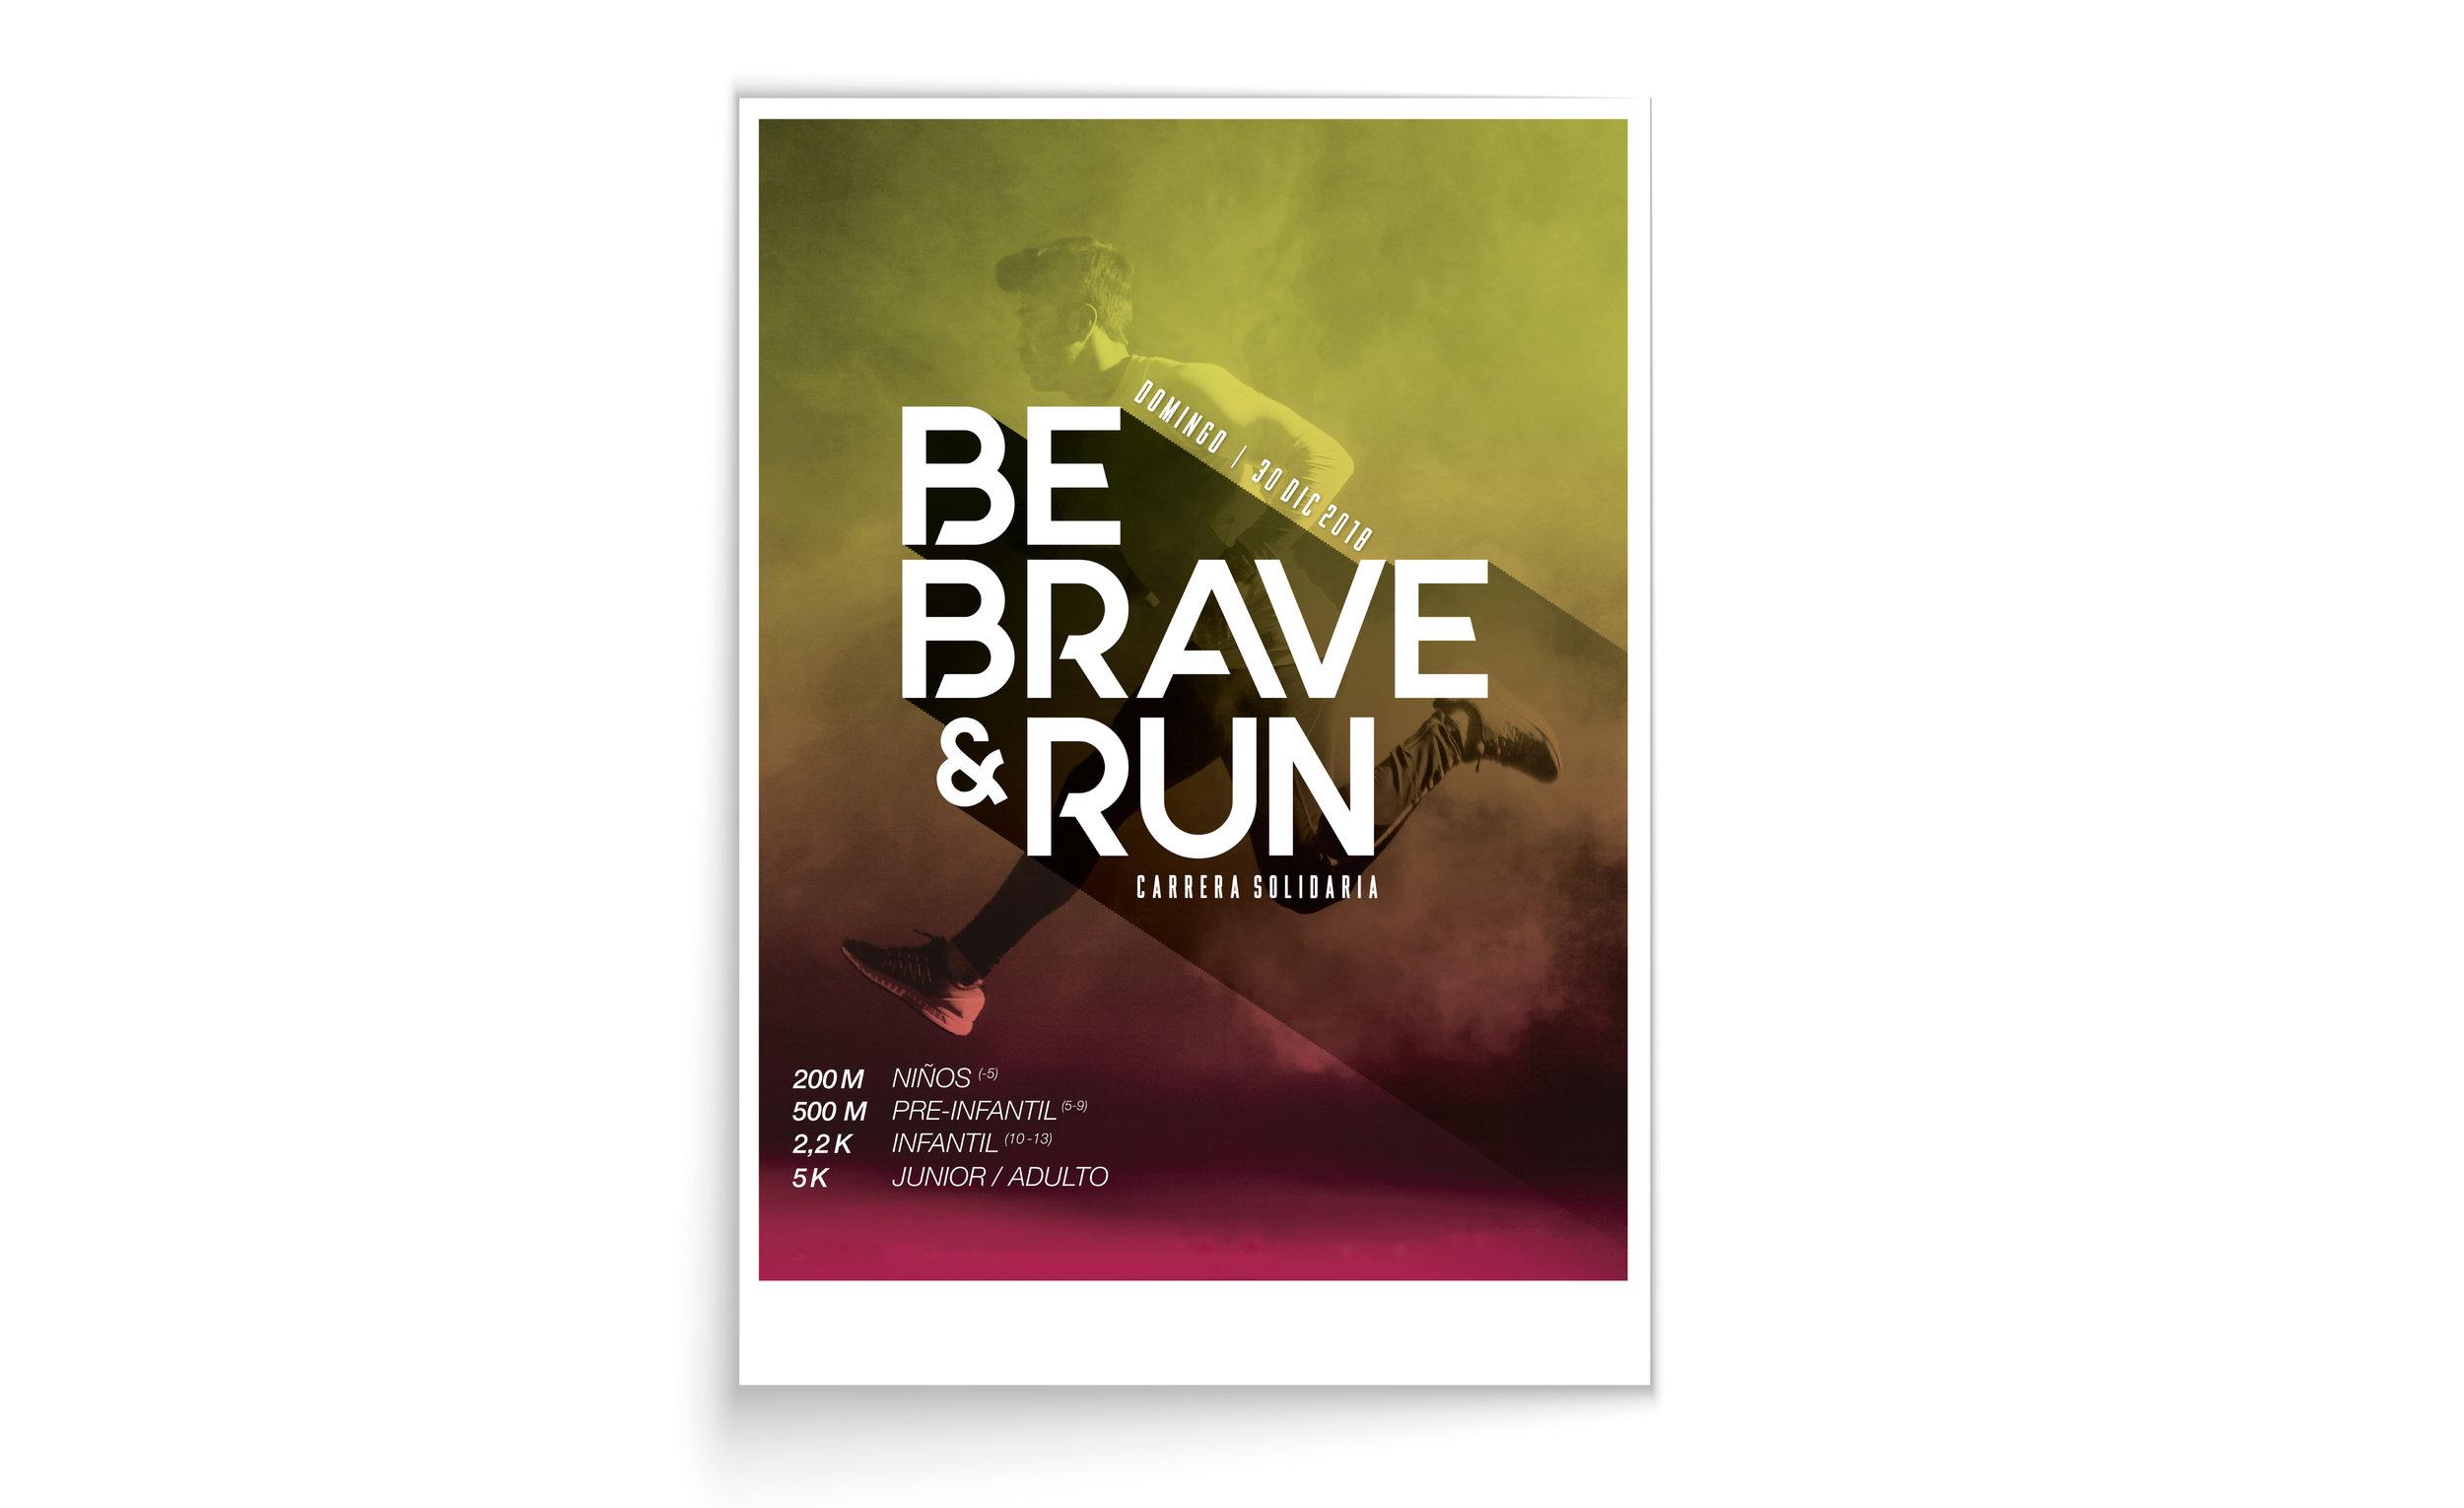 BE brave poster-01.jpg